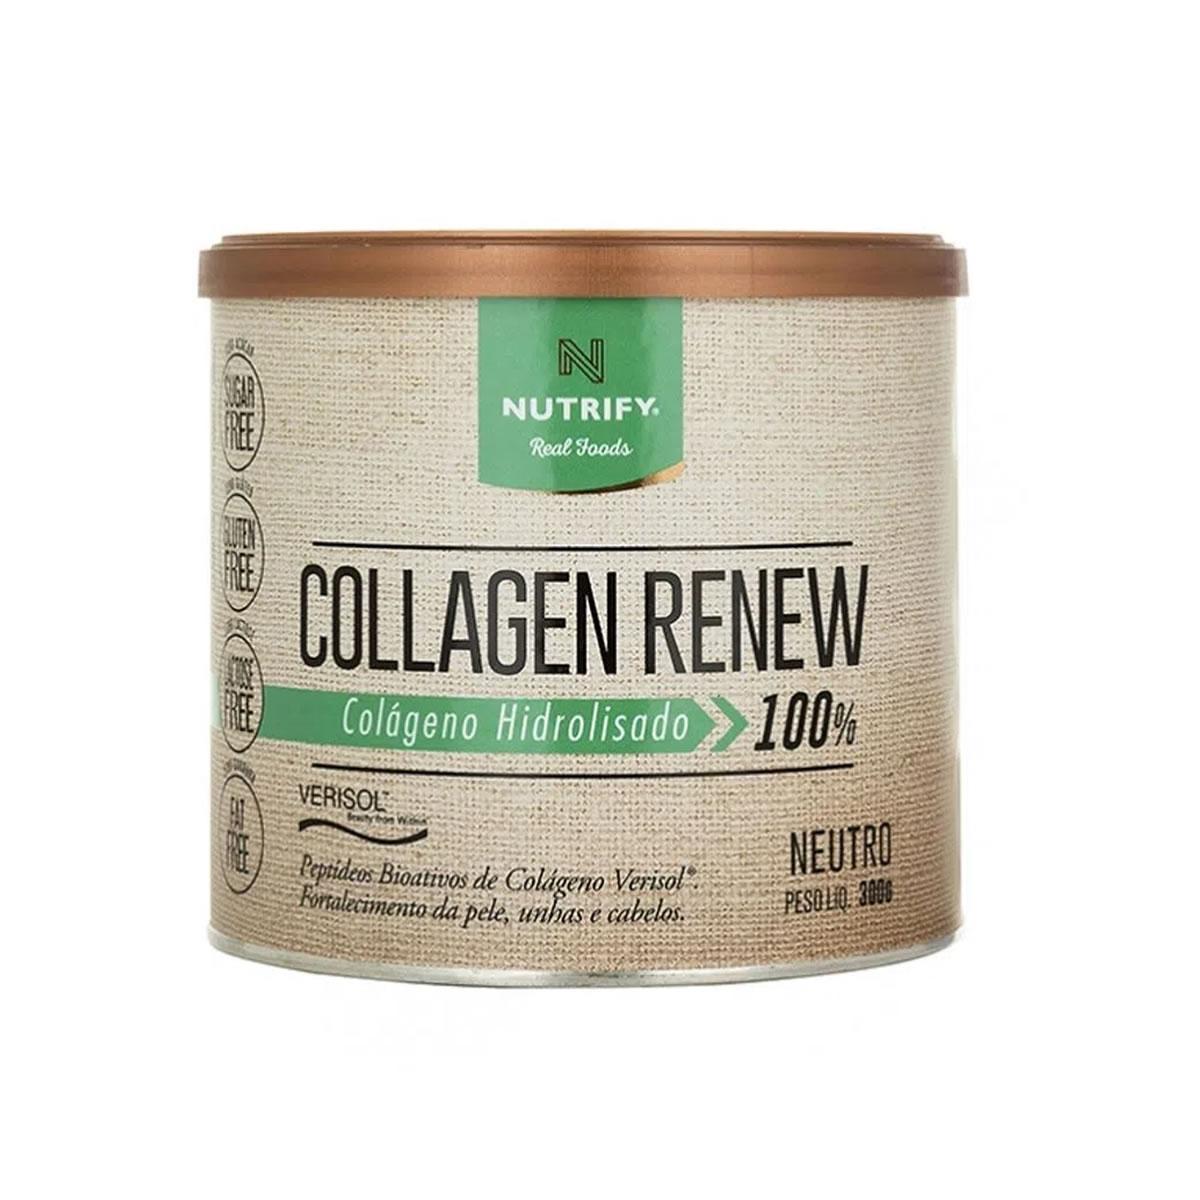 Colágeno Collagen Renew sabor Neutro 300g - Nutrify